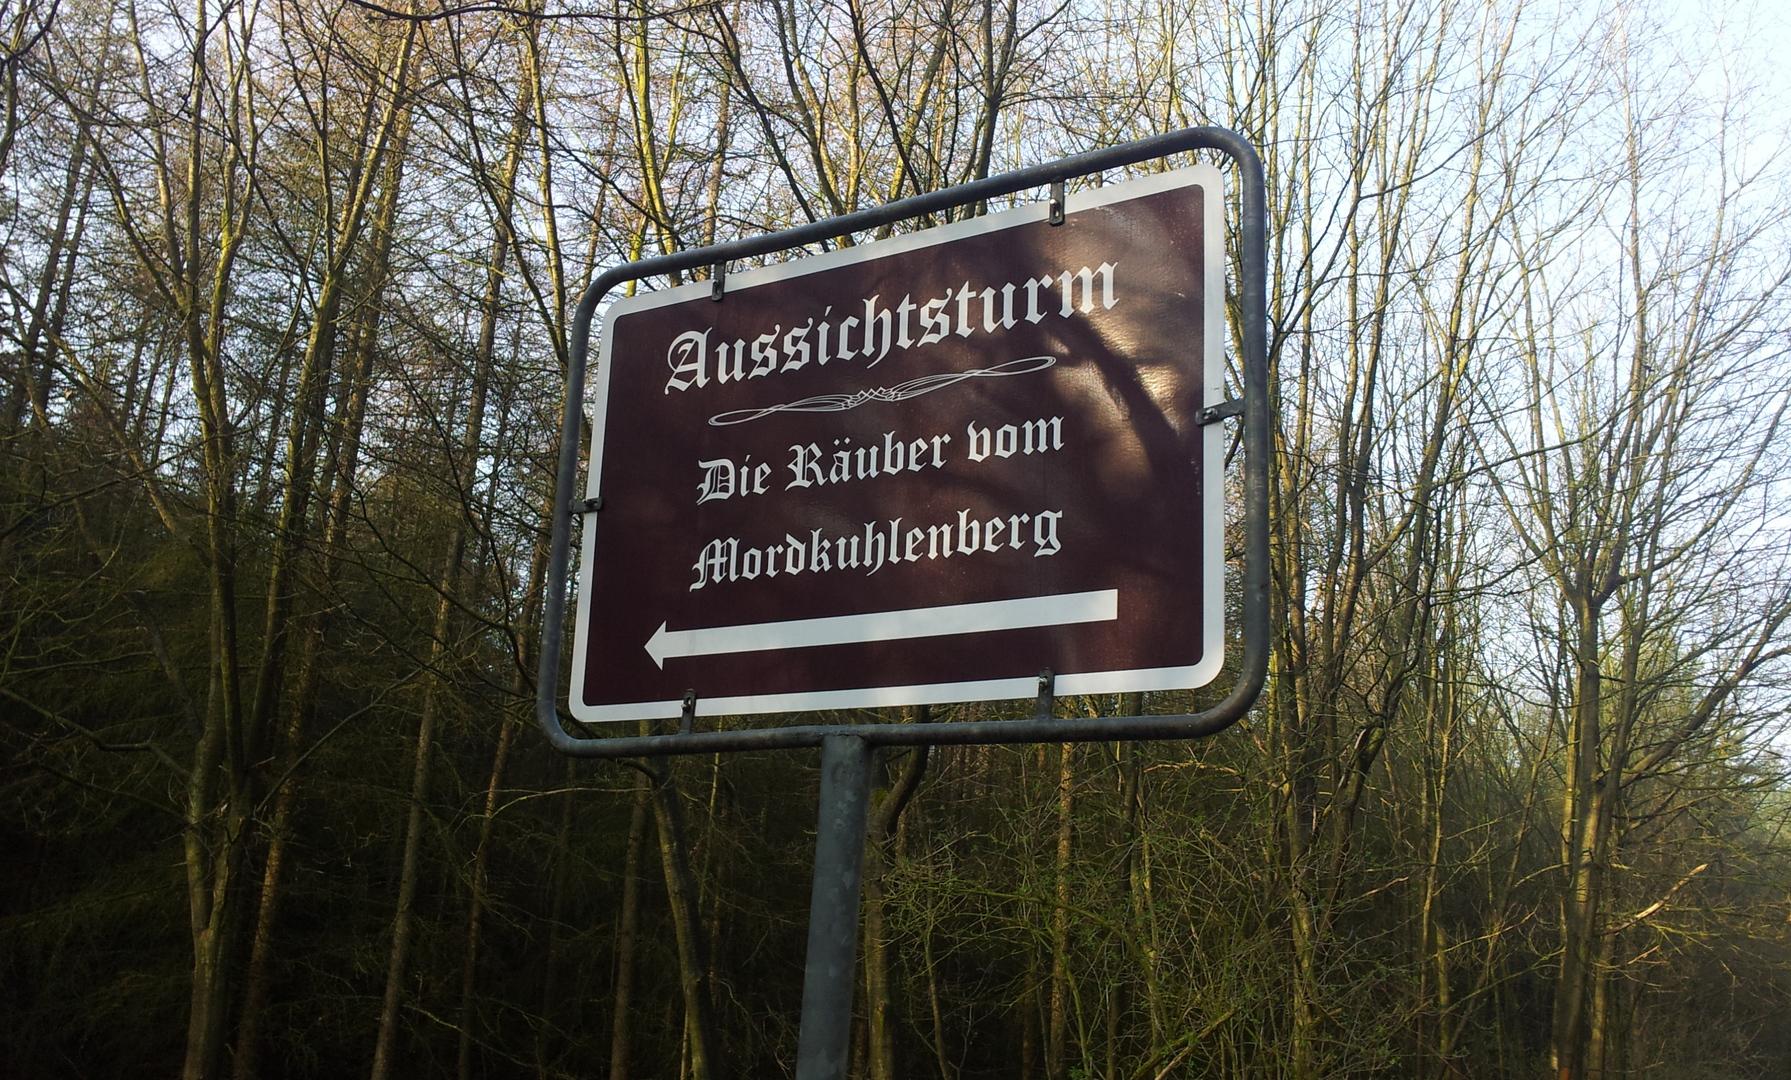 Die Sage vom Mordkuhlenberg (nach Hermann Lübbing)